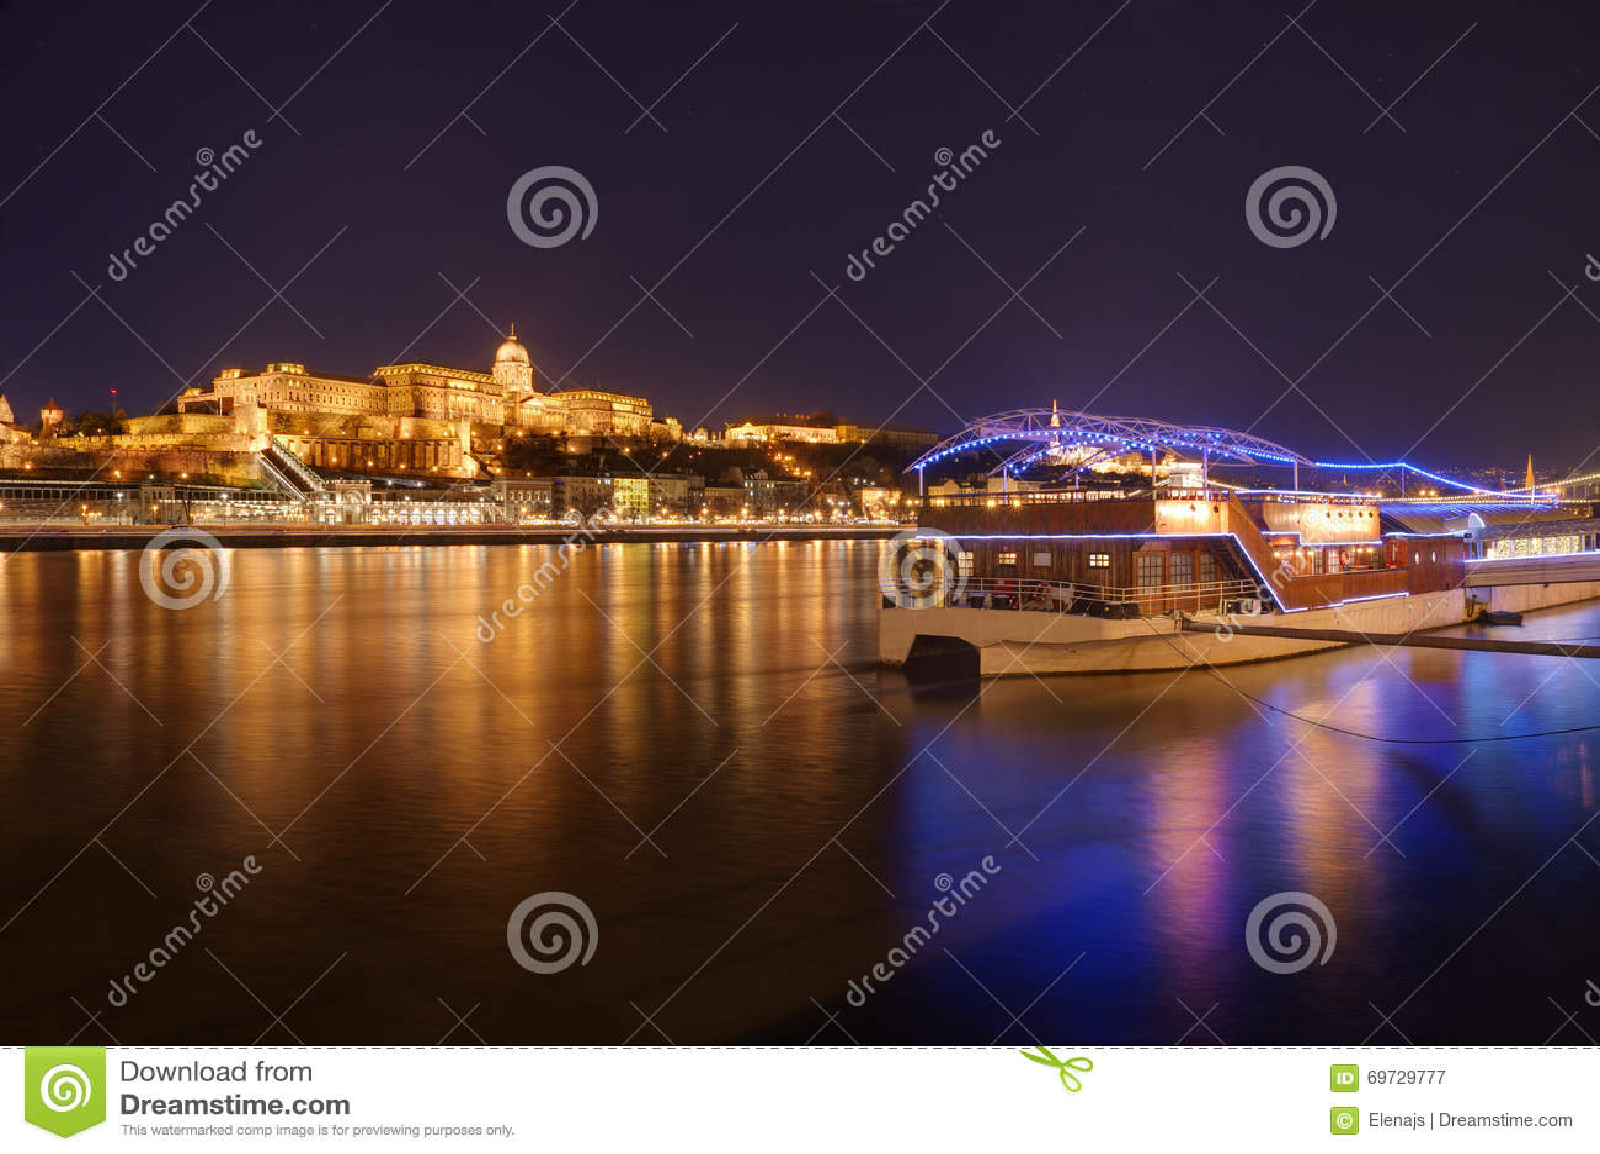 Hungary, Budapest, Castle Buda - night picture